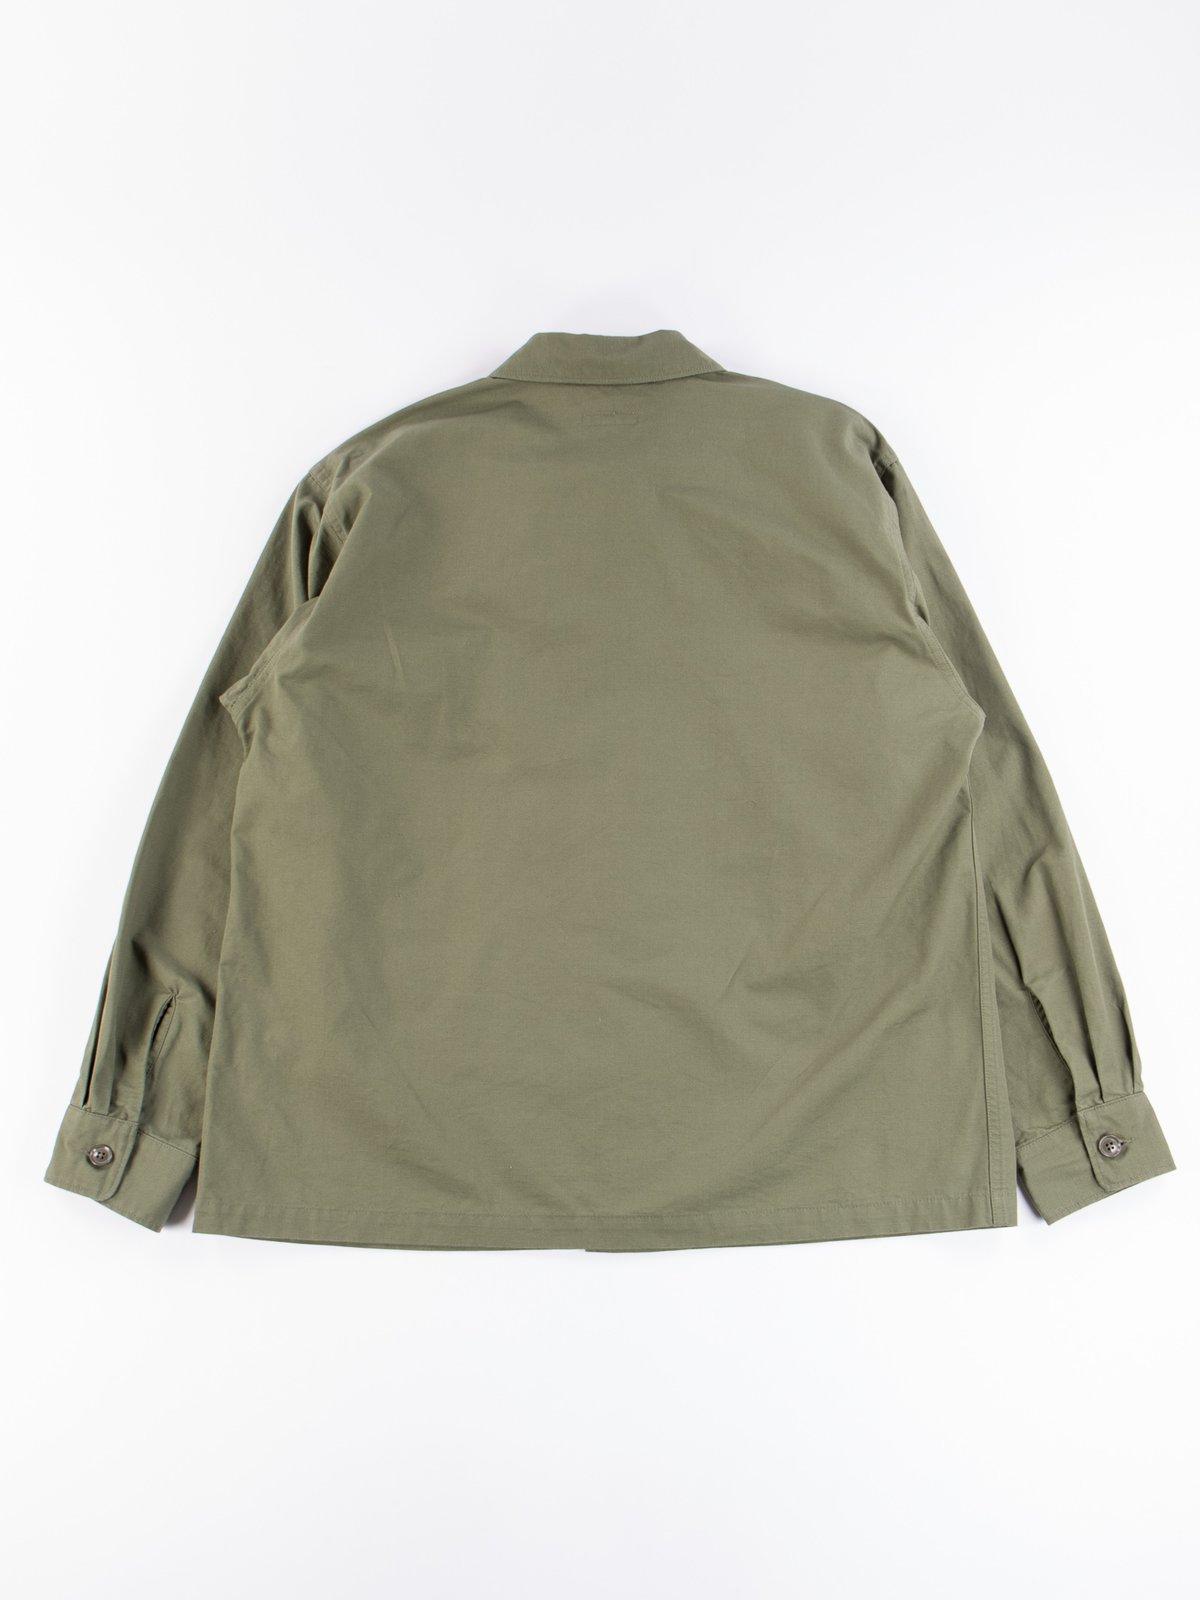 Olive Cotton Ripstop MC Shirt Jacket - Image 7